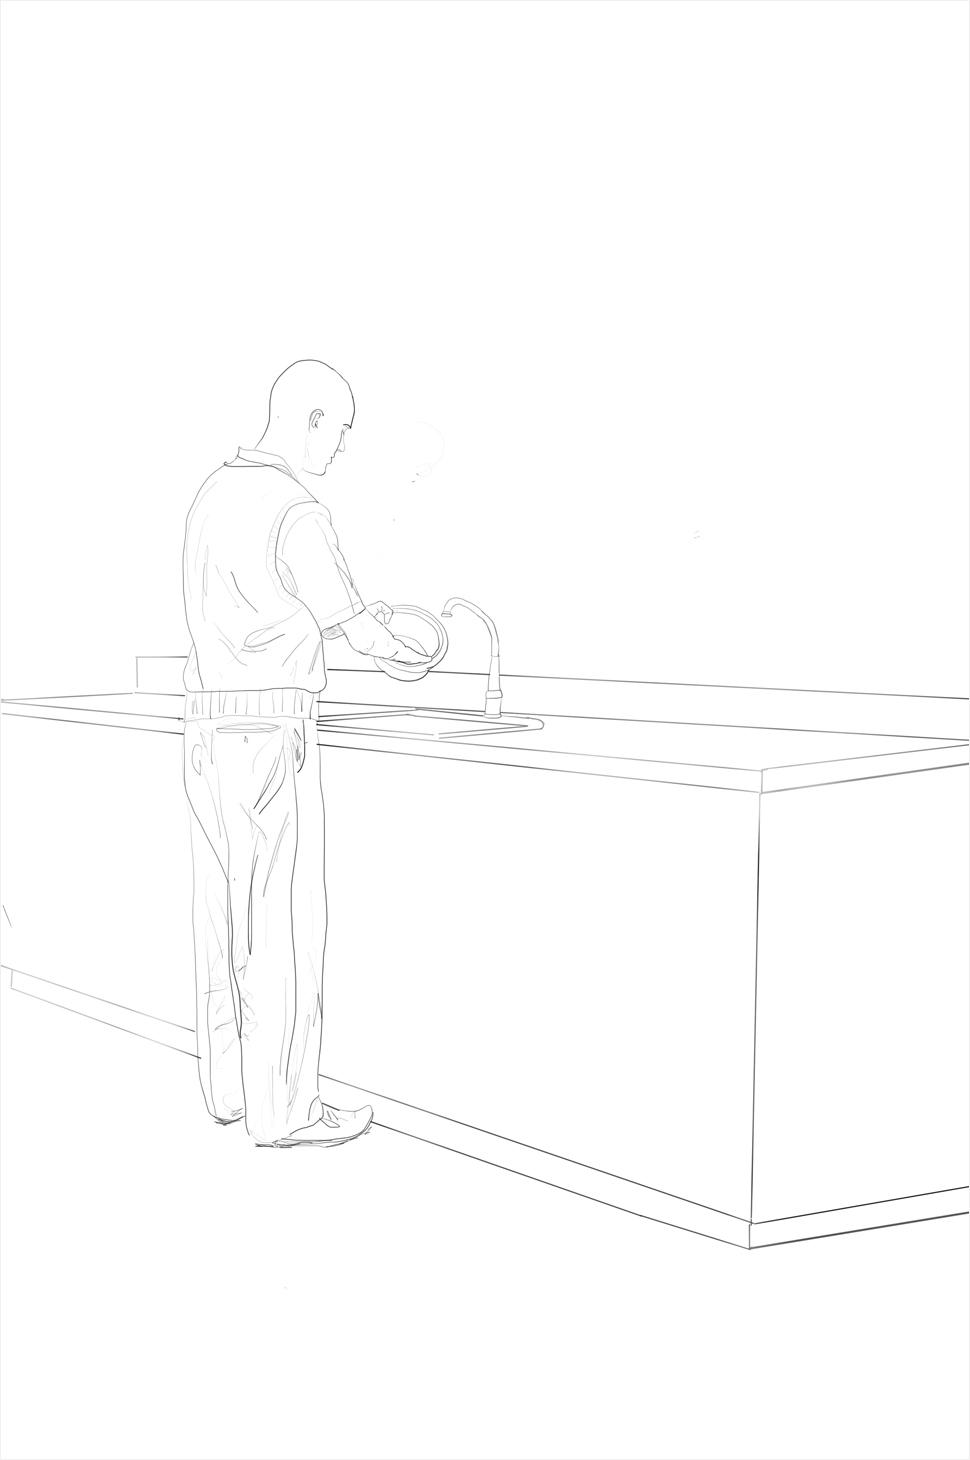 Michael Frels  - Washing Dishes